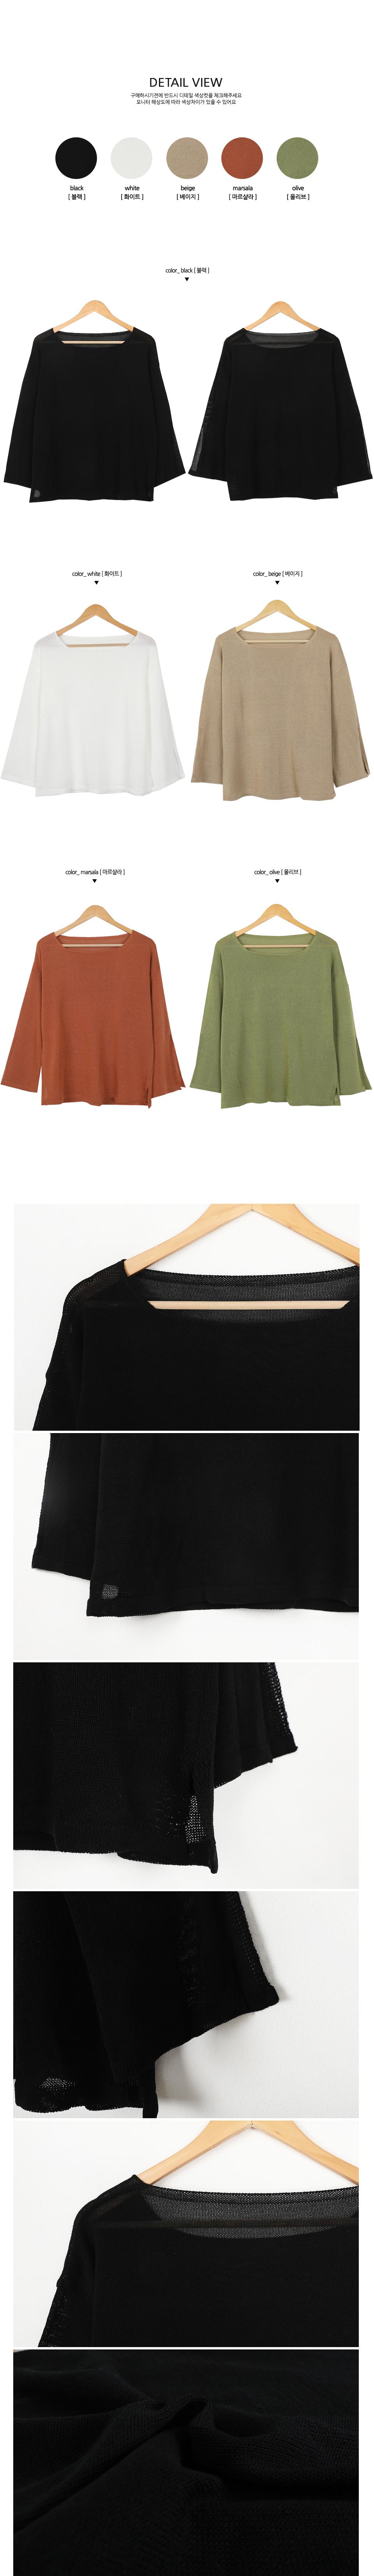 Square-cut loose knit